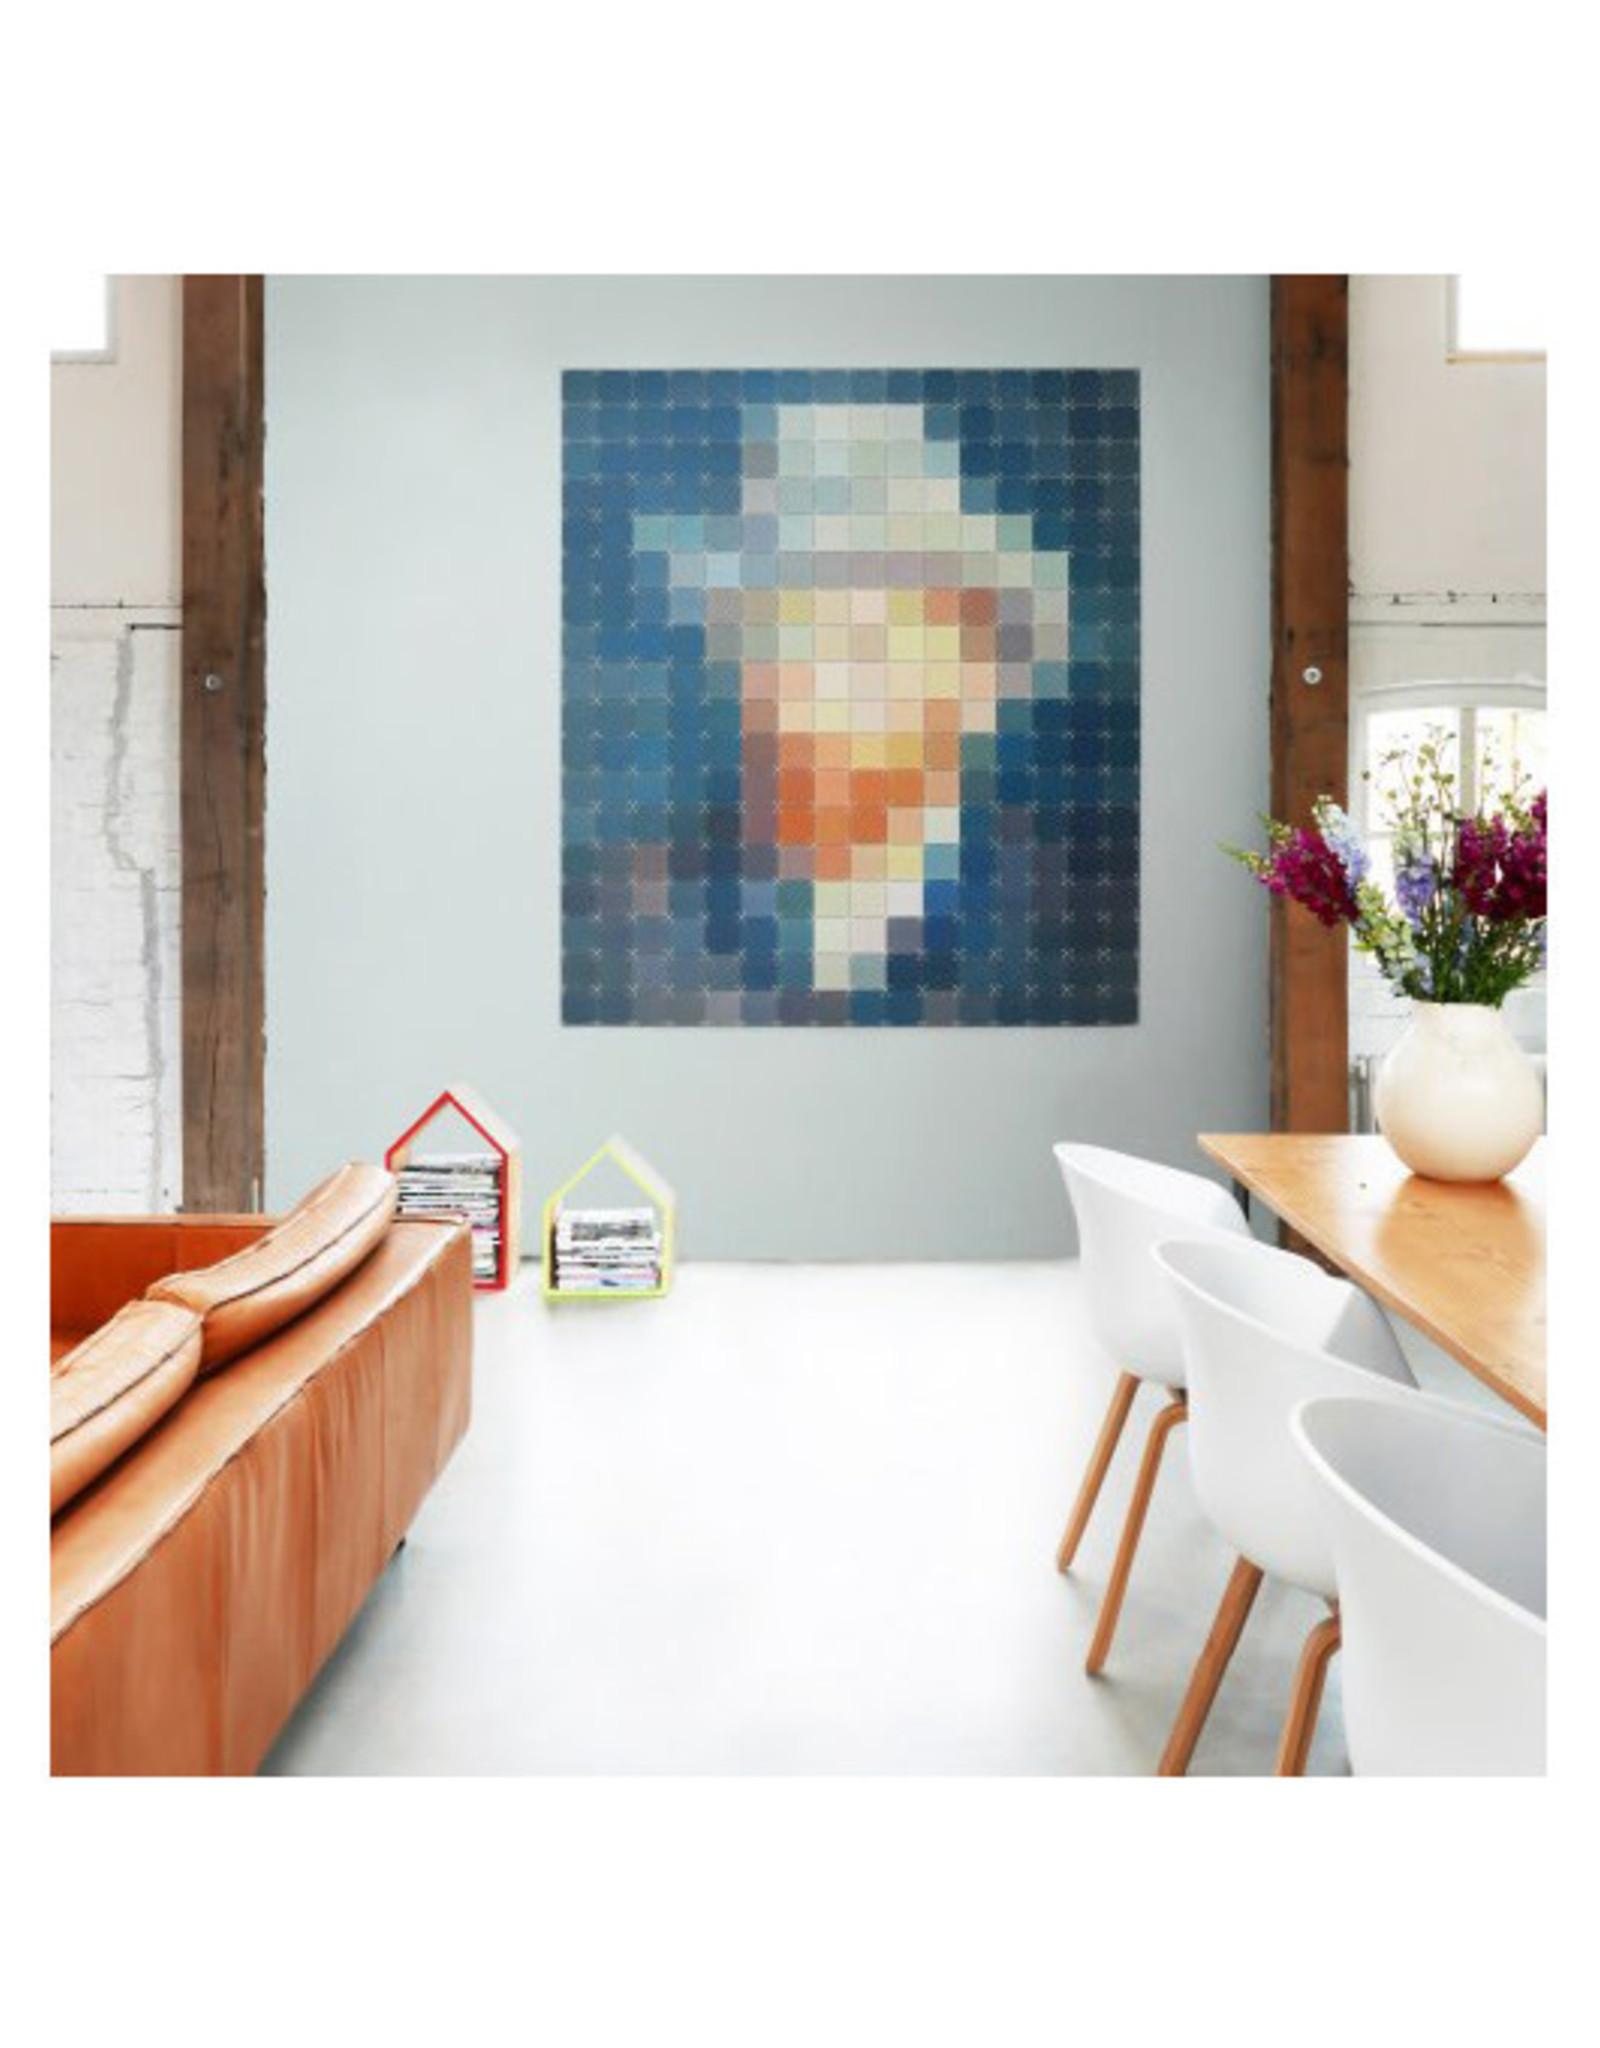 IXXI Pixelated Van Gogh Petrol - 160cm x 180cm